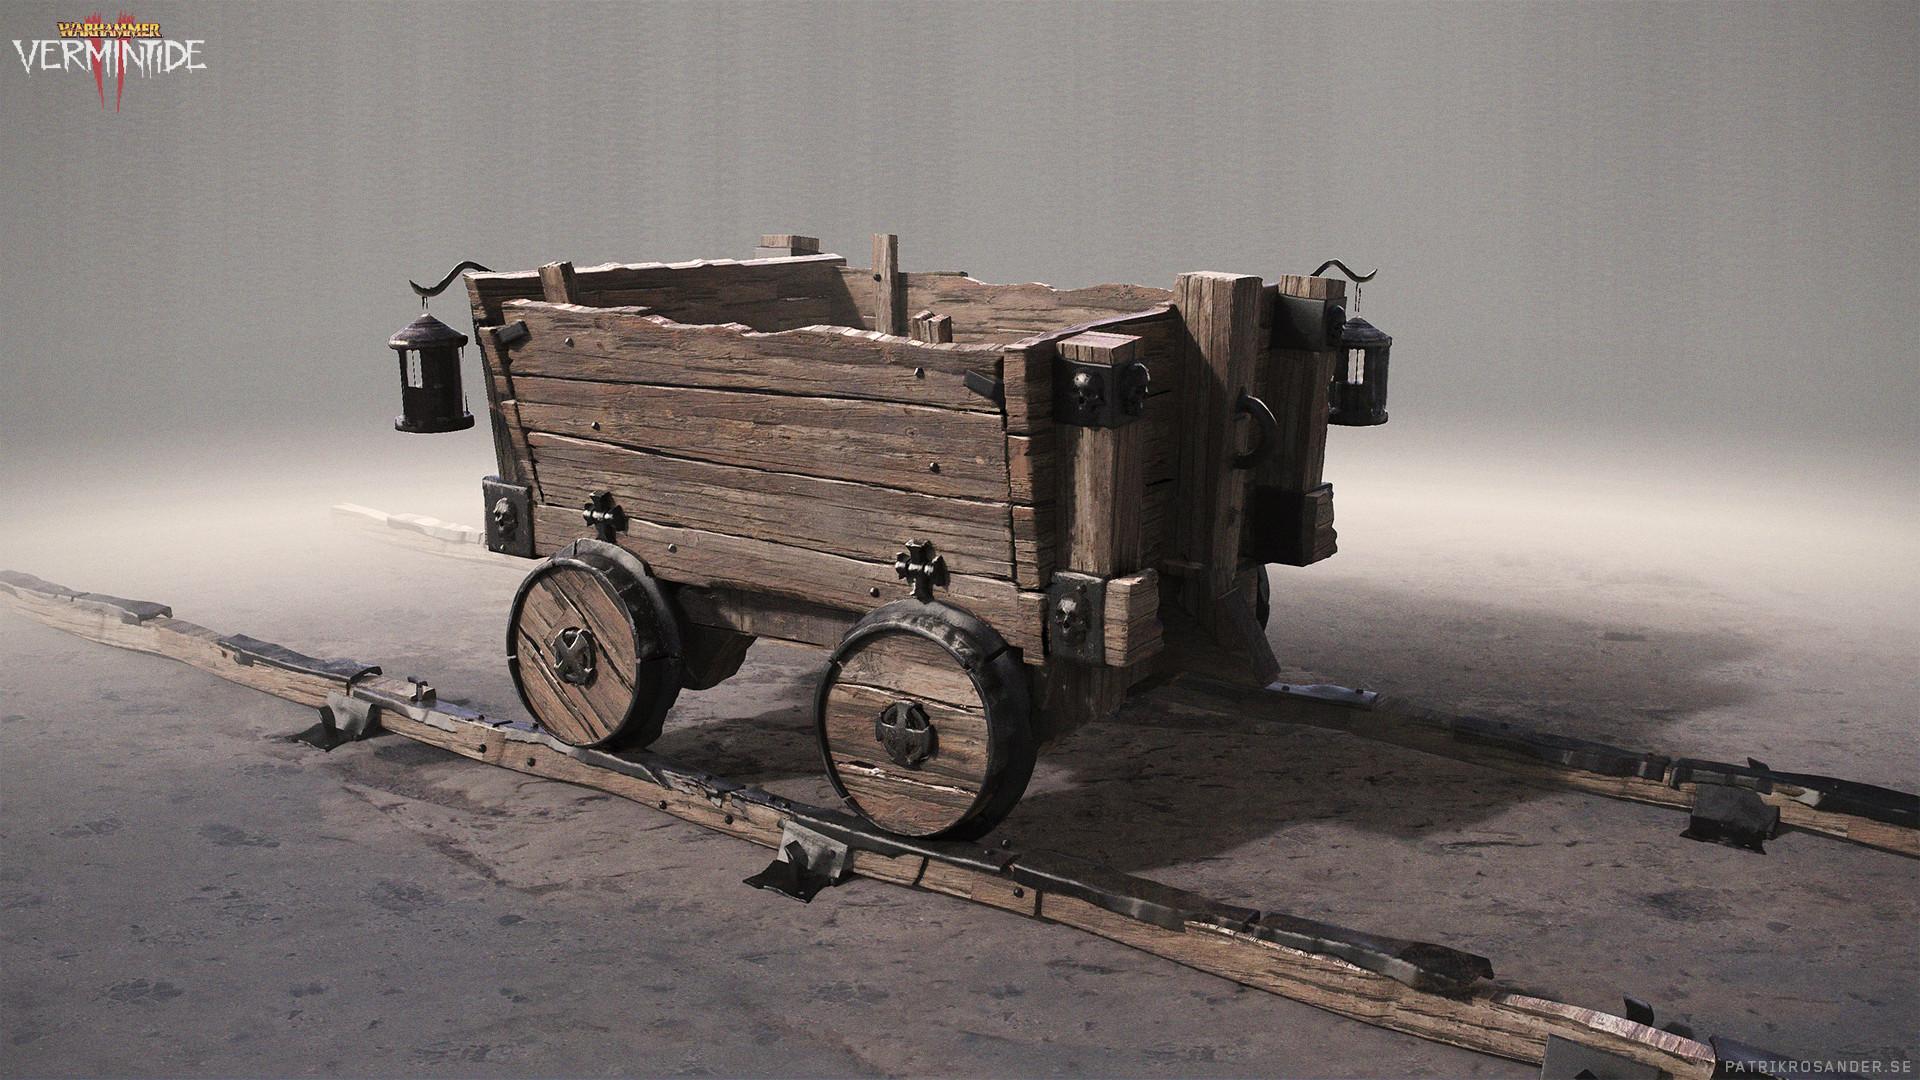 Patrik rosander mines minecart